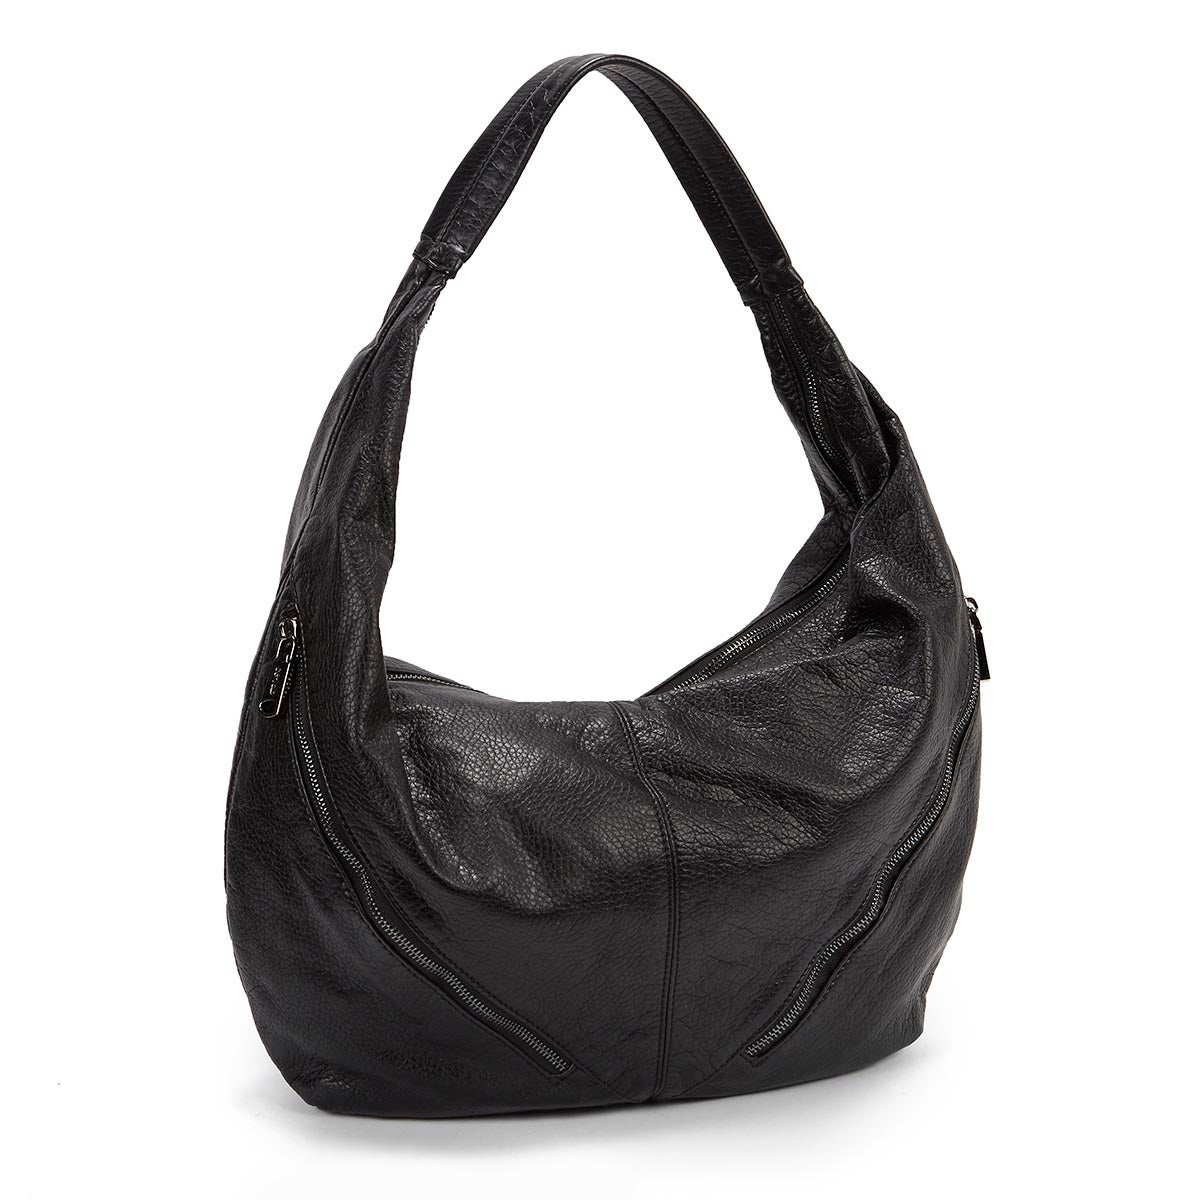 Lds The Wash black zip up hobo bag